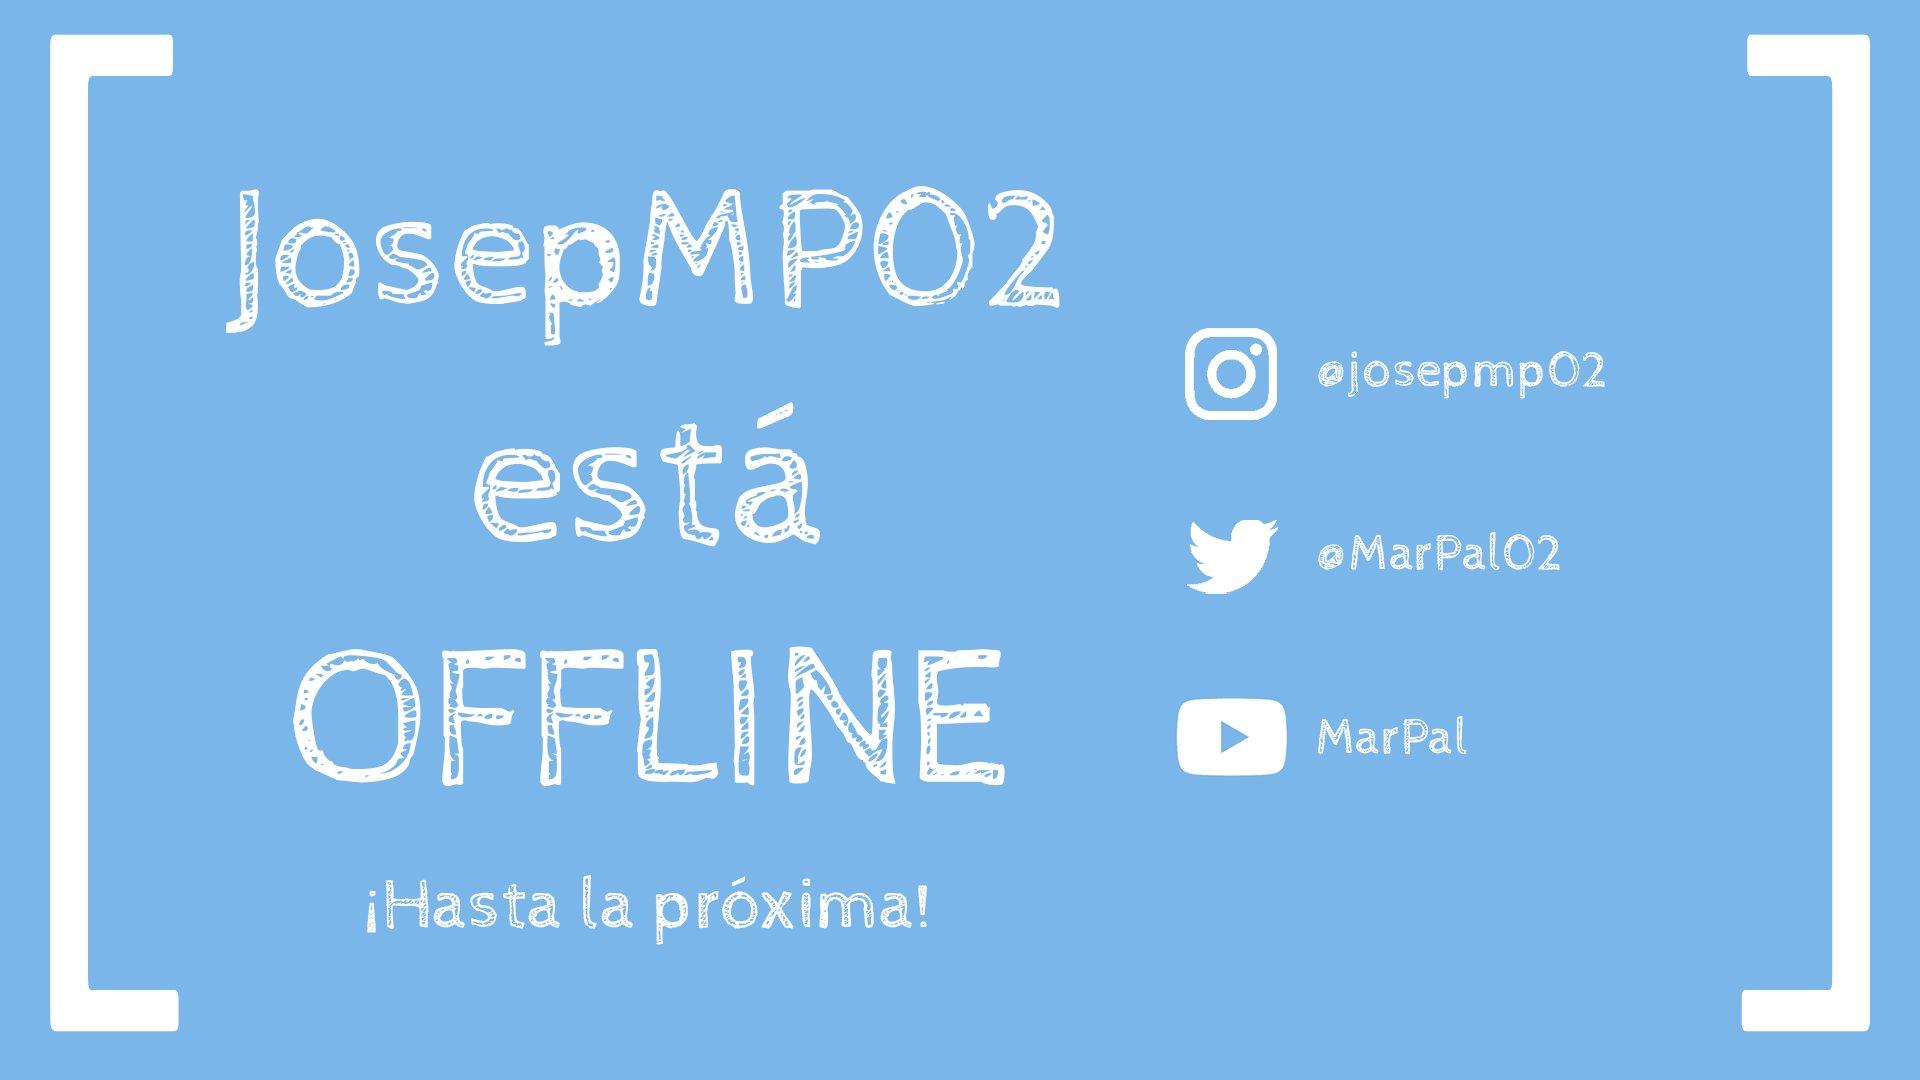 JosepMP02